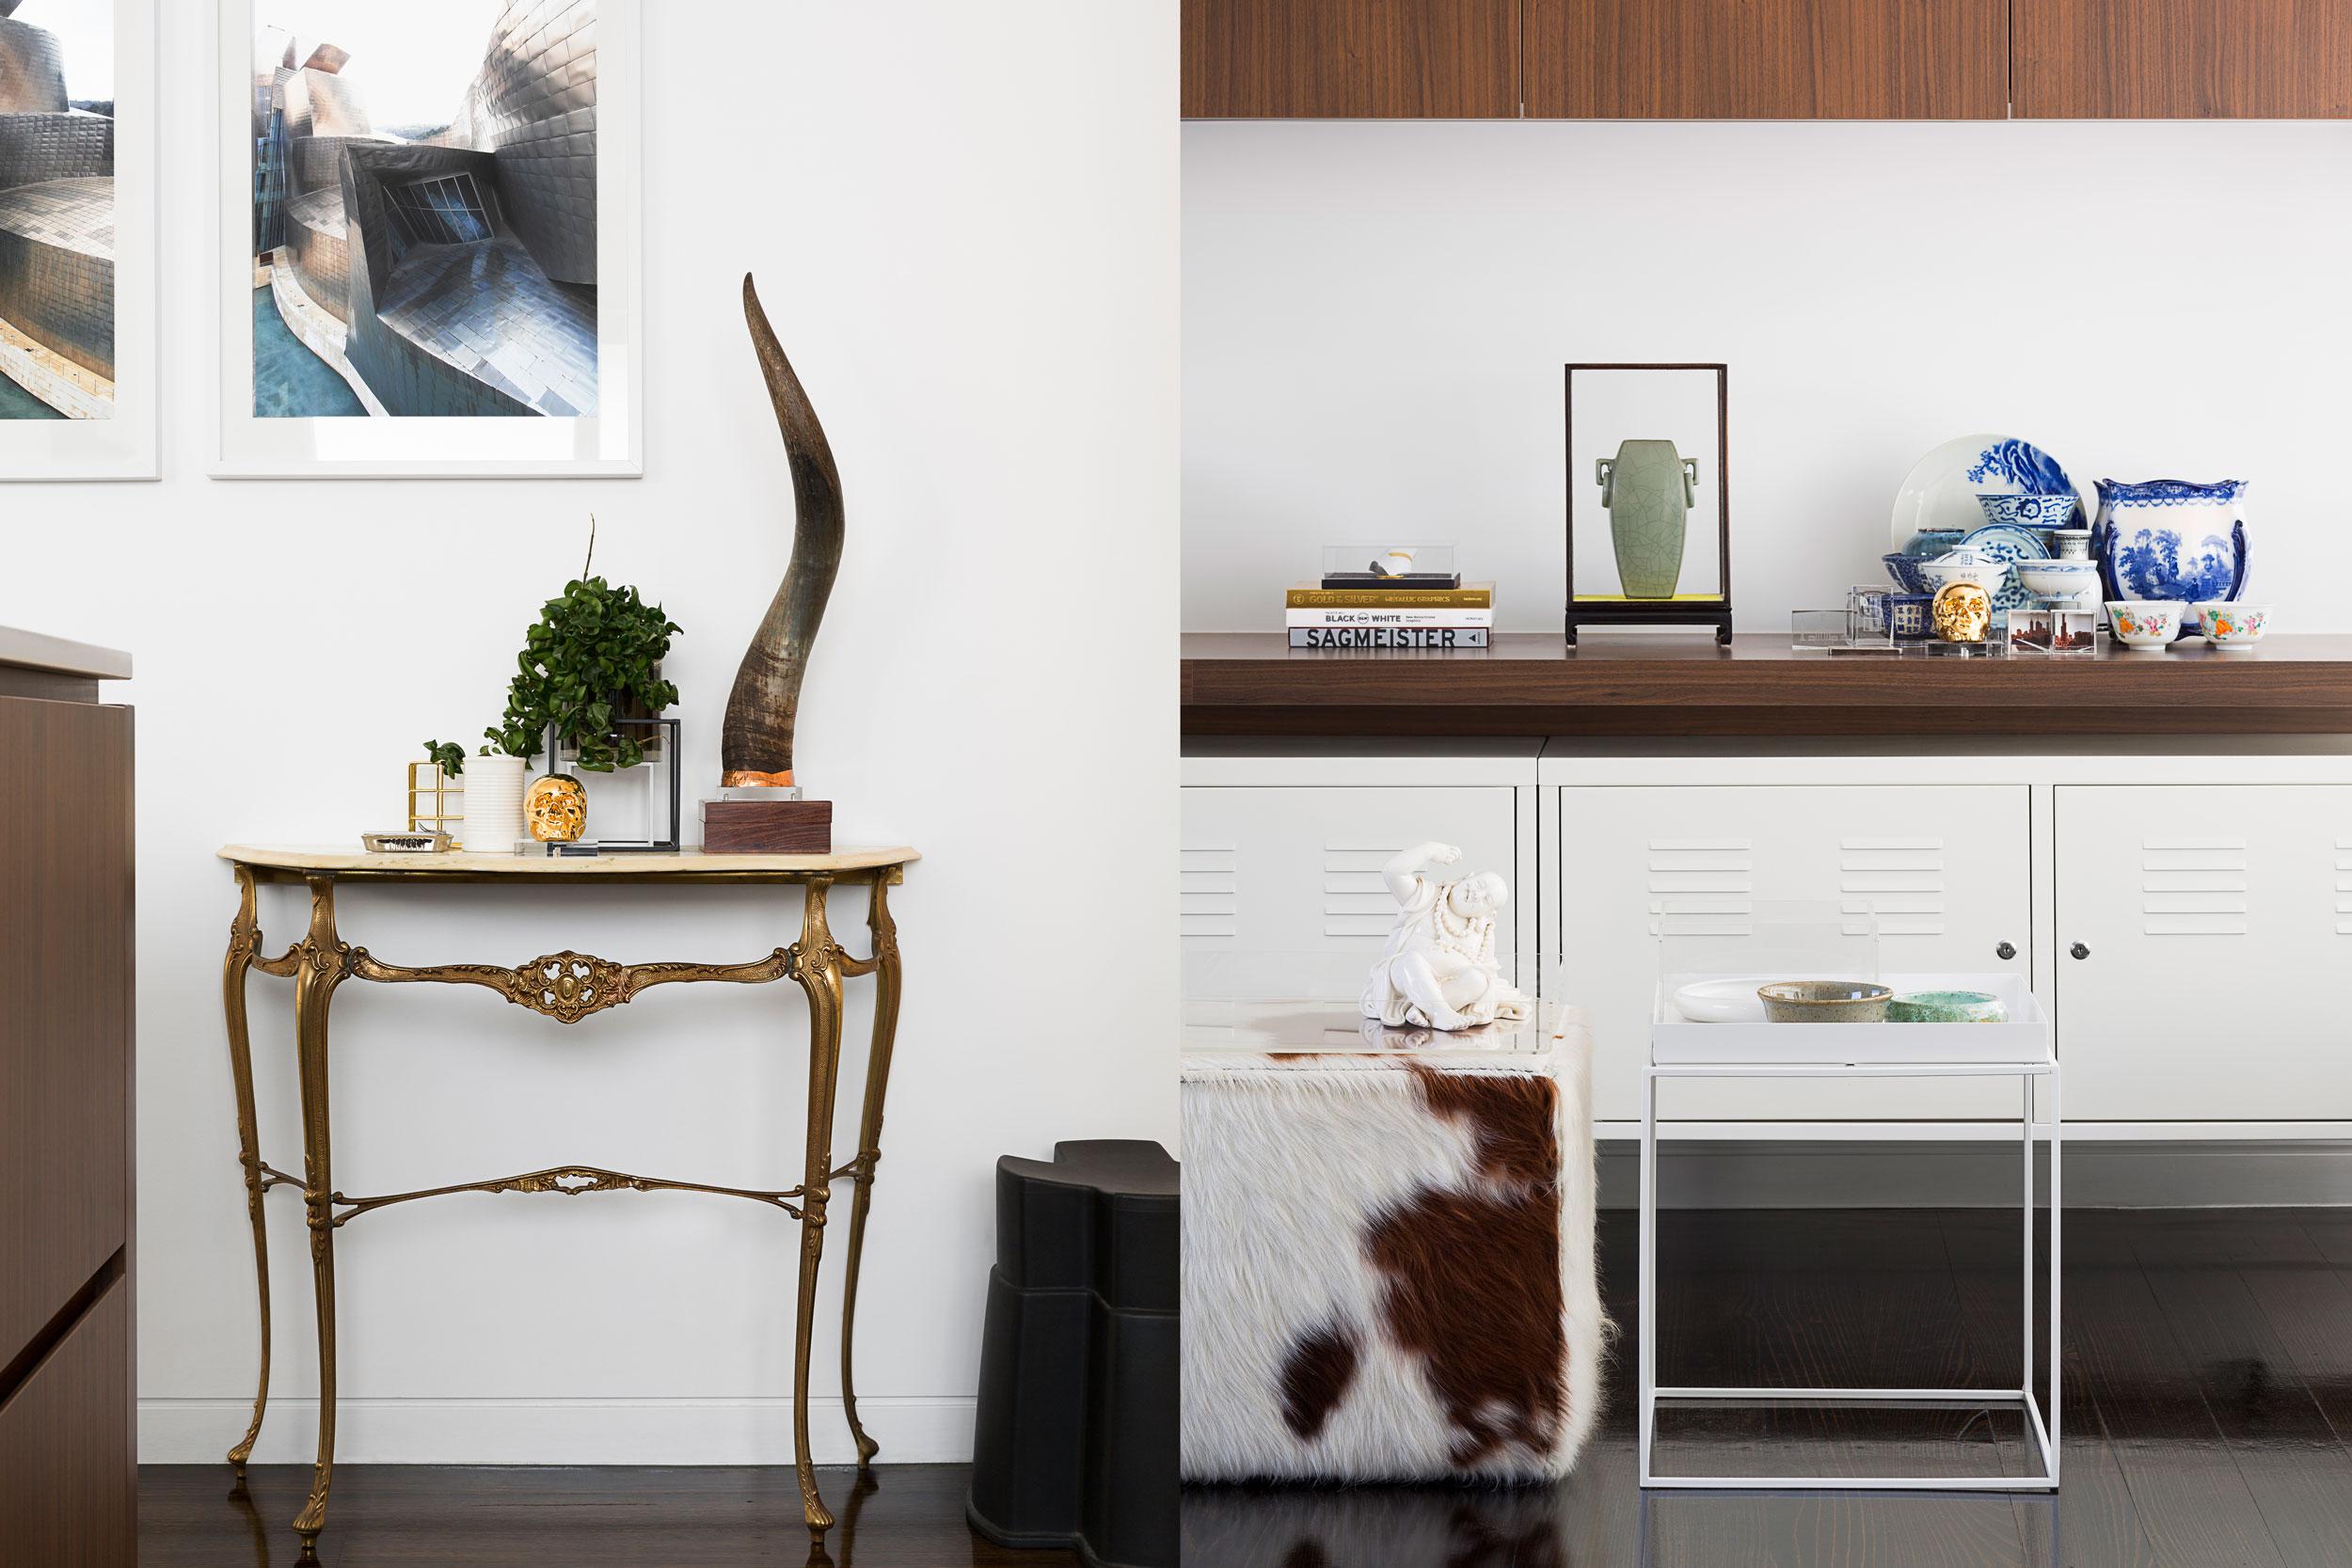 Sarah_Anderson_Photography_SWG_Studio_interior_loungeroom_hall_stand